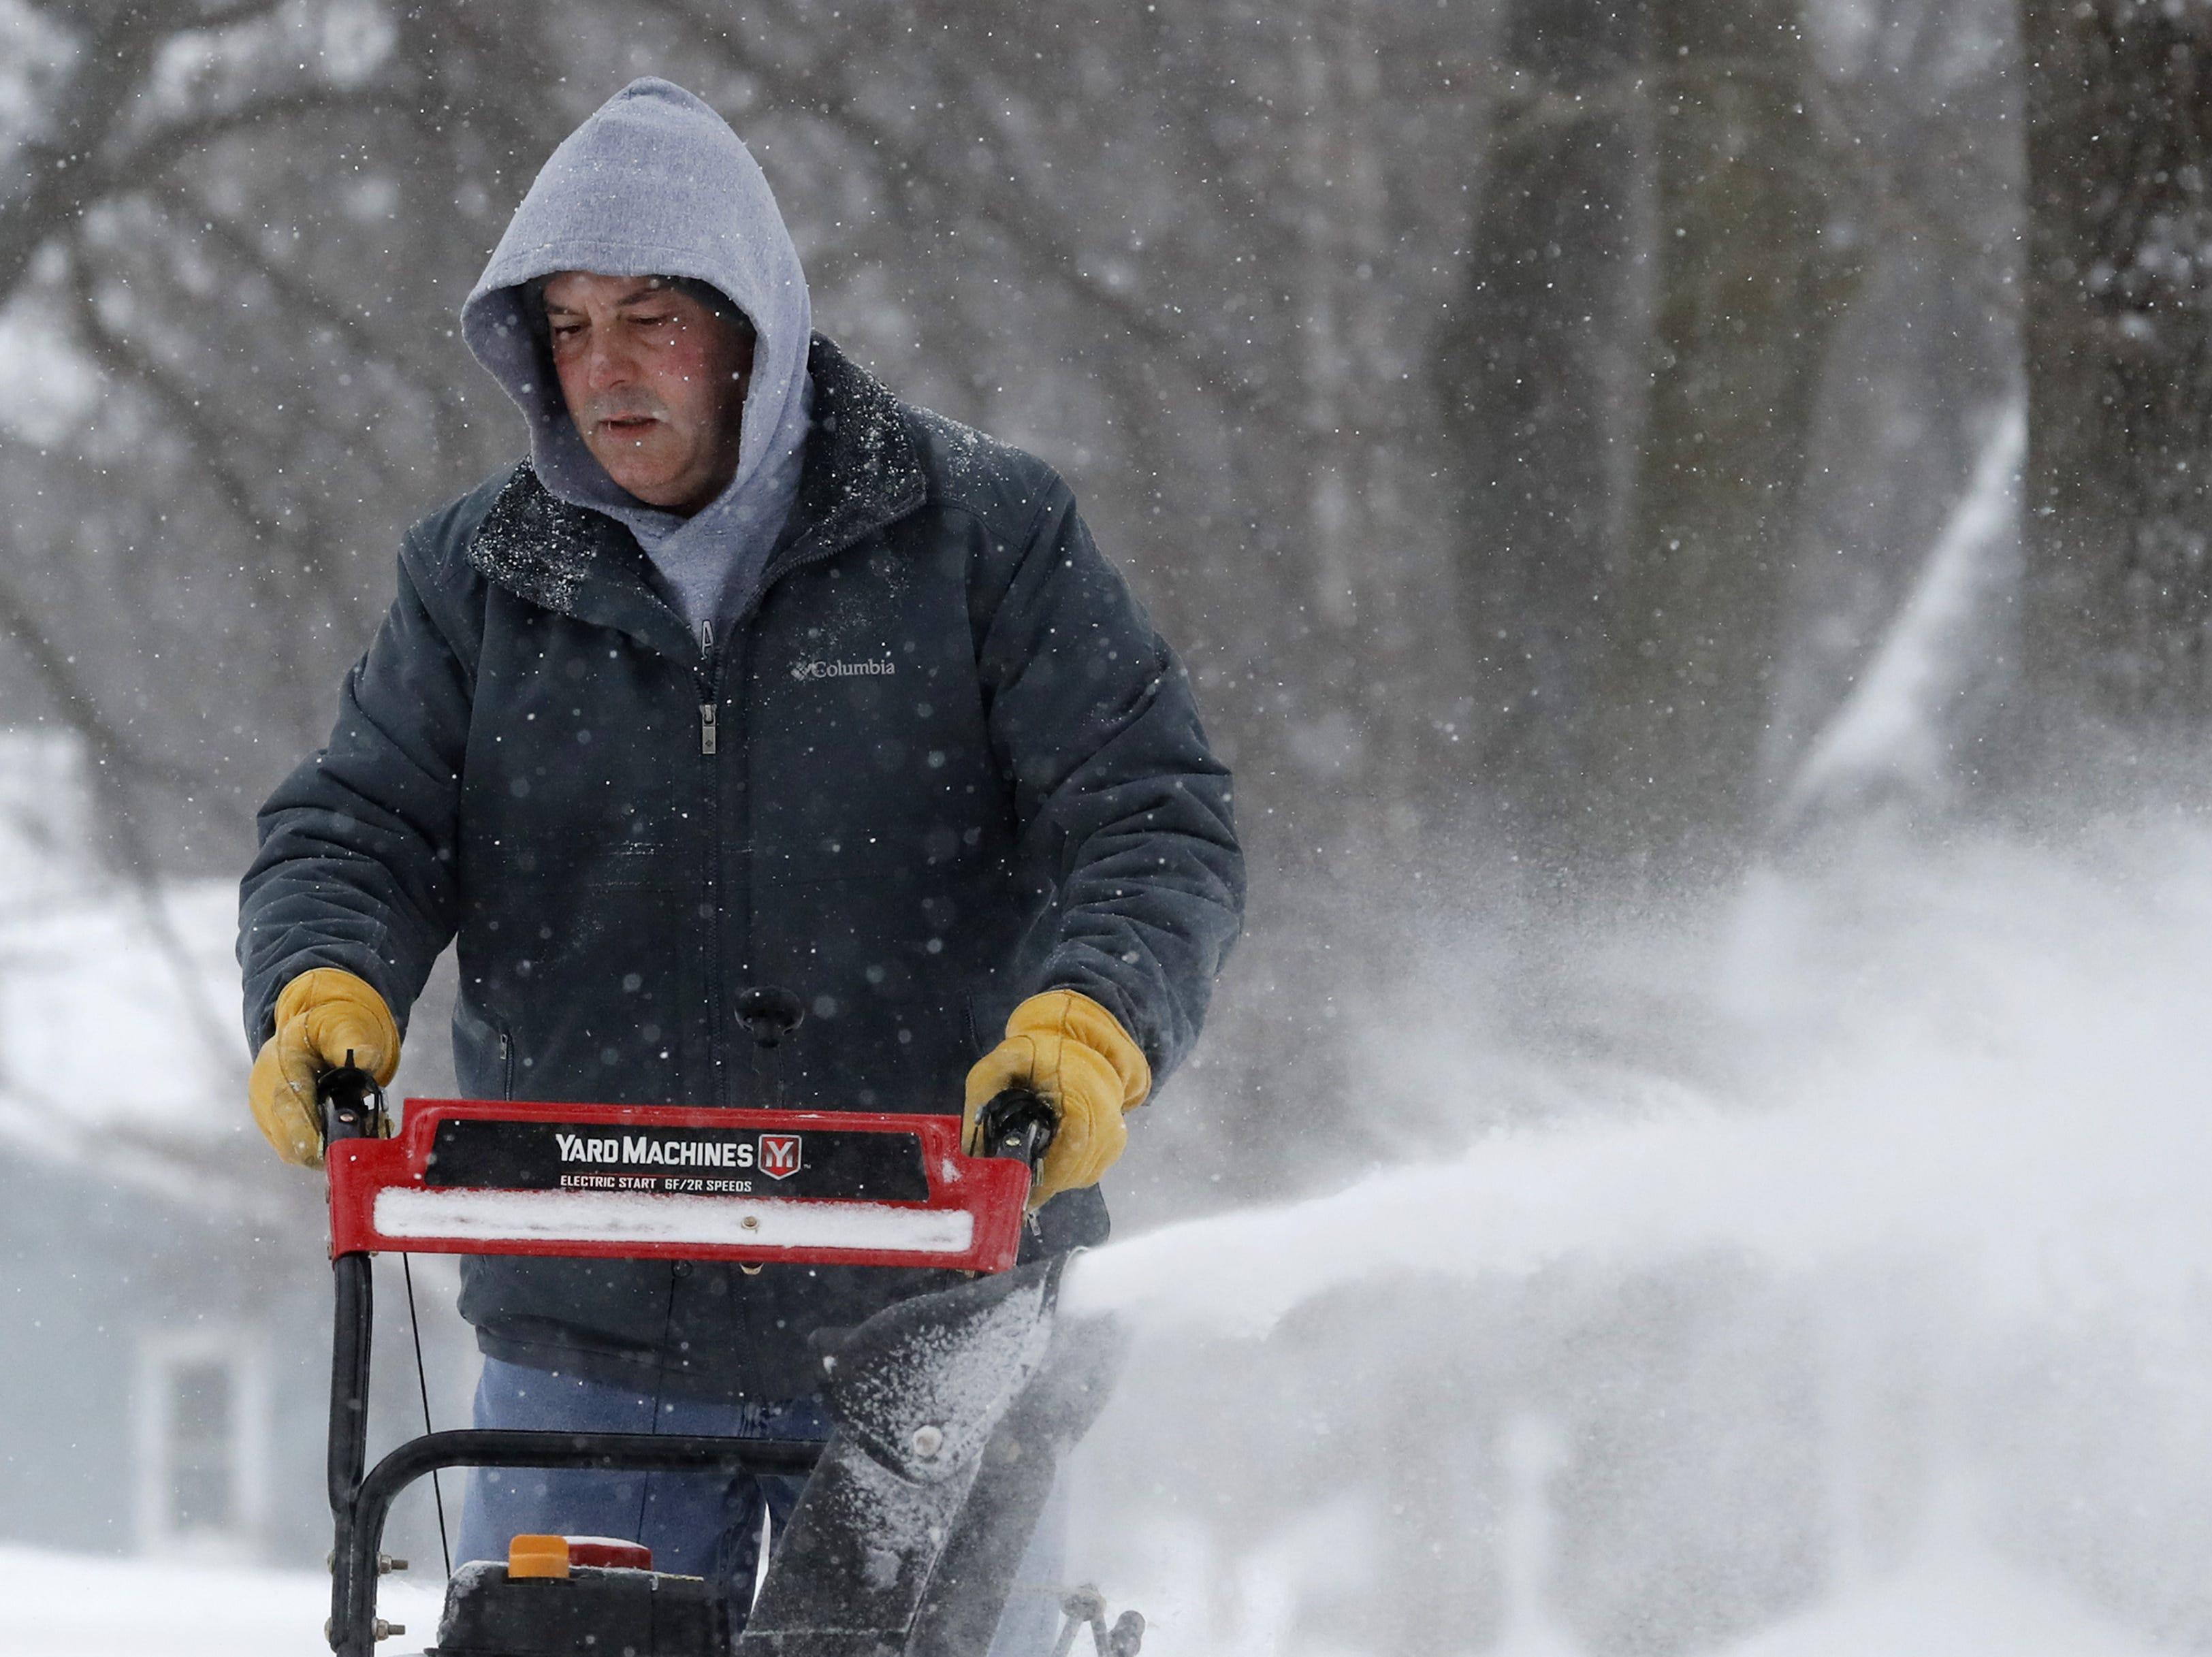 Jerry Lincoln, of Menasha, snowblows a neighbor's sidewalk Monday, Jan. 28, 2019, in Menasha, Wis.